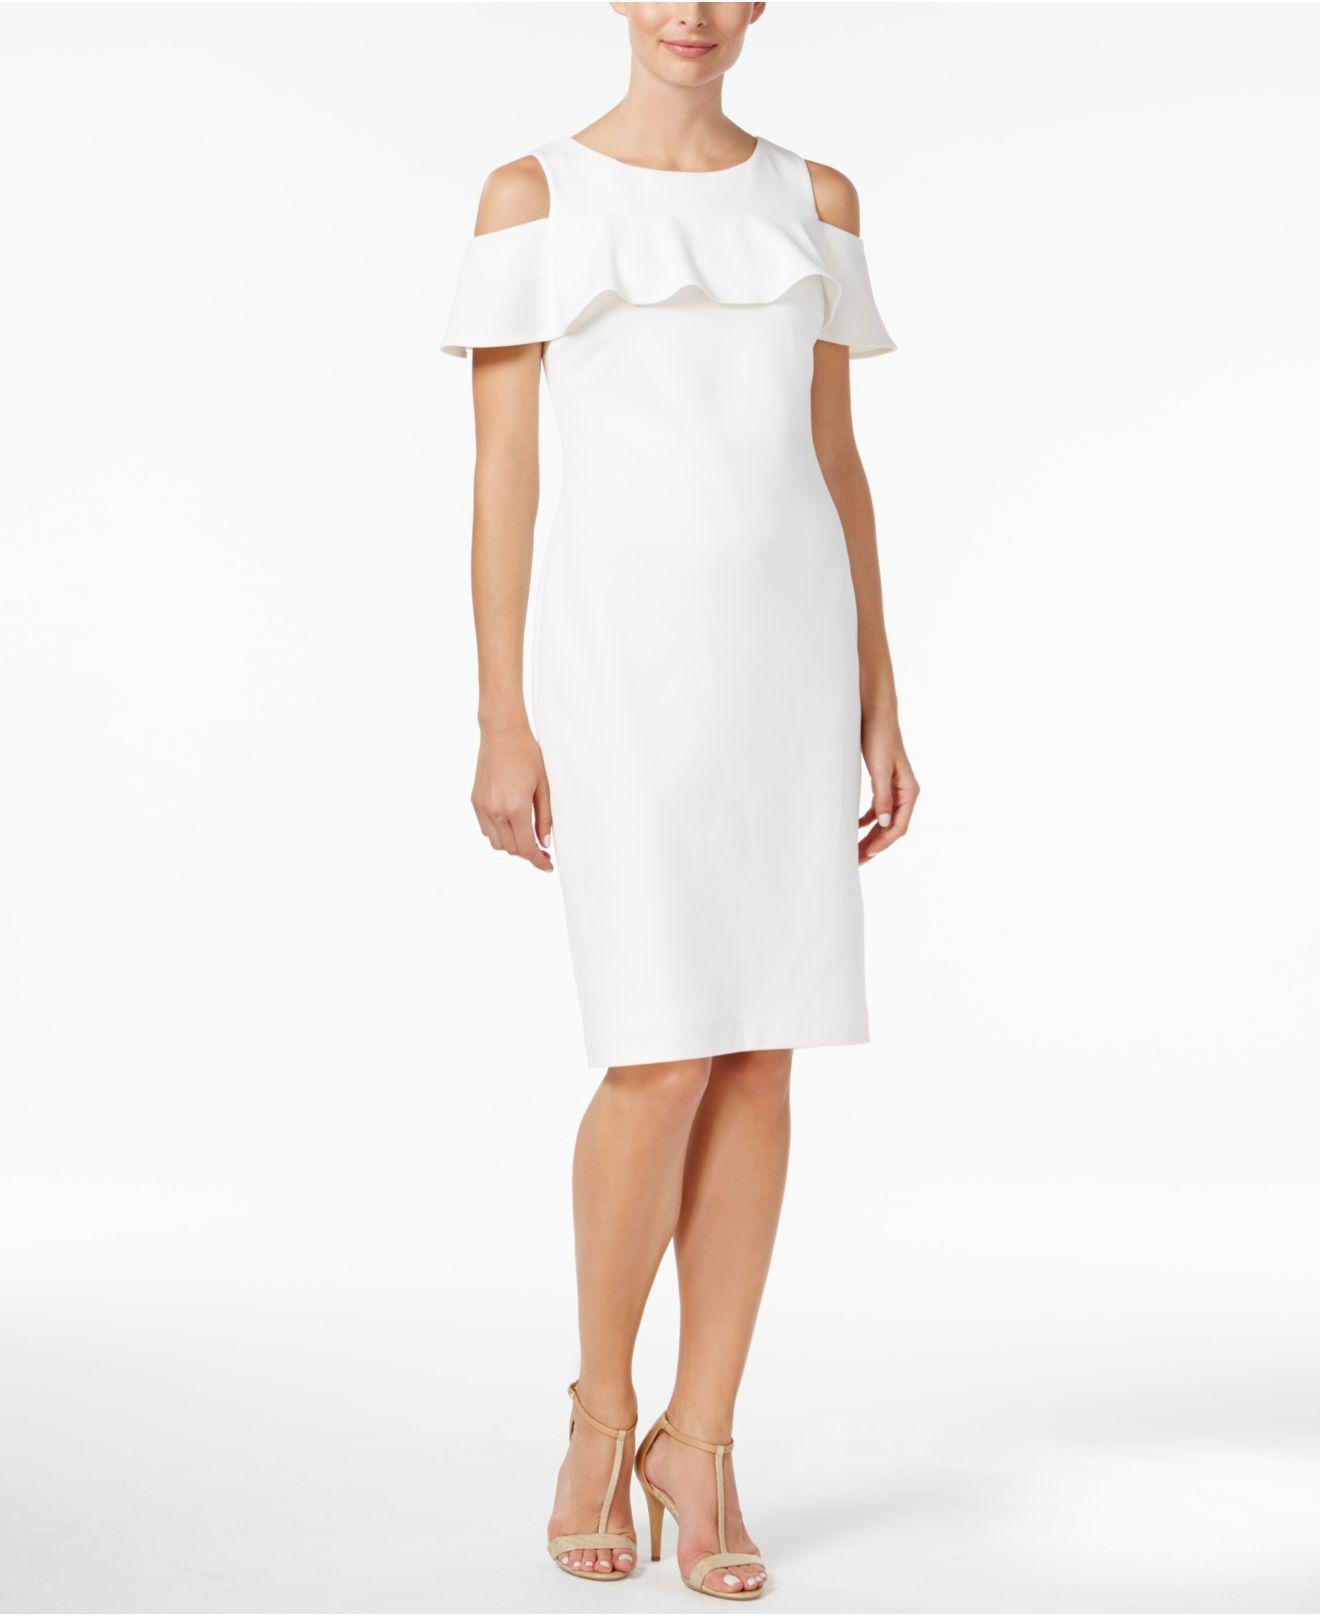 7f73a4adb40 Calvin Klein Cold-shoulder Ruffle Sheath Dress in White - Lyst